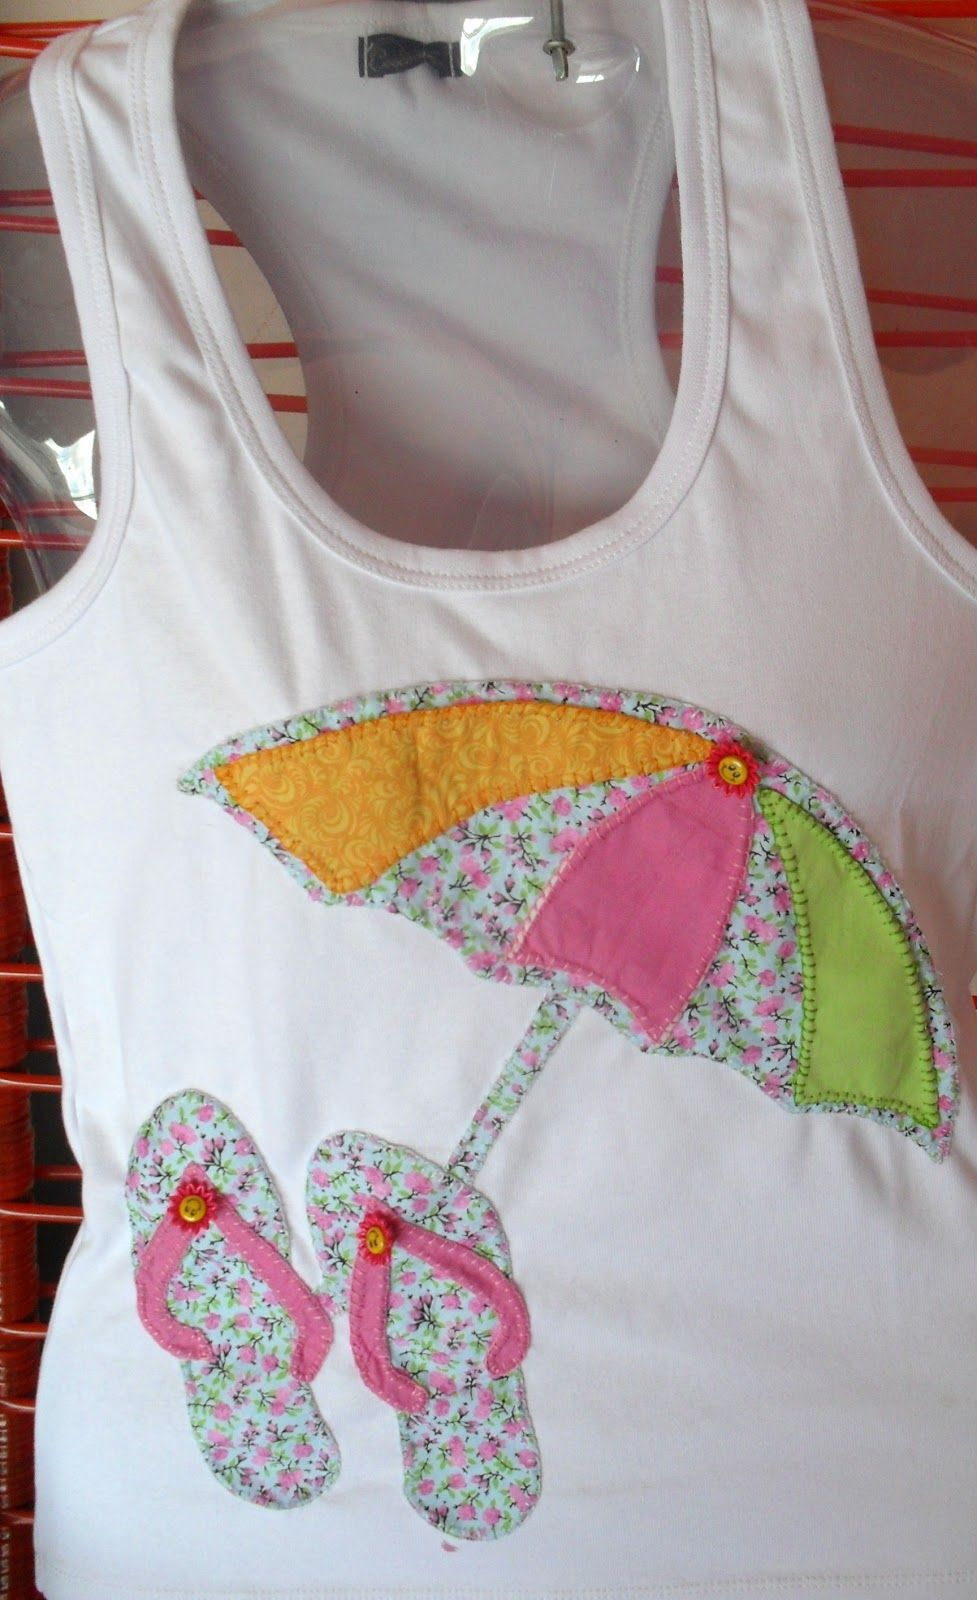 Pintura em camisetas passo a passo pesquisa google - Pintura para camisetas ...